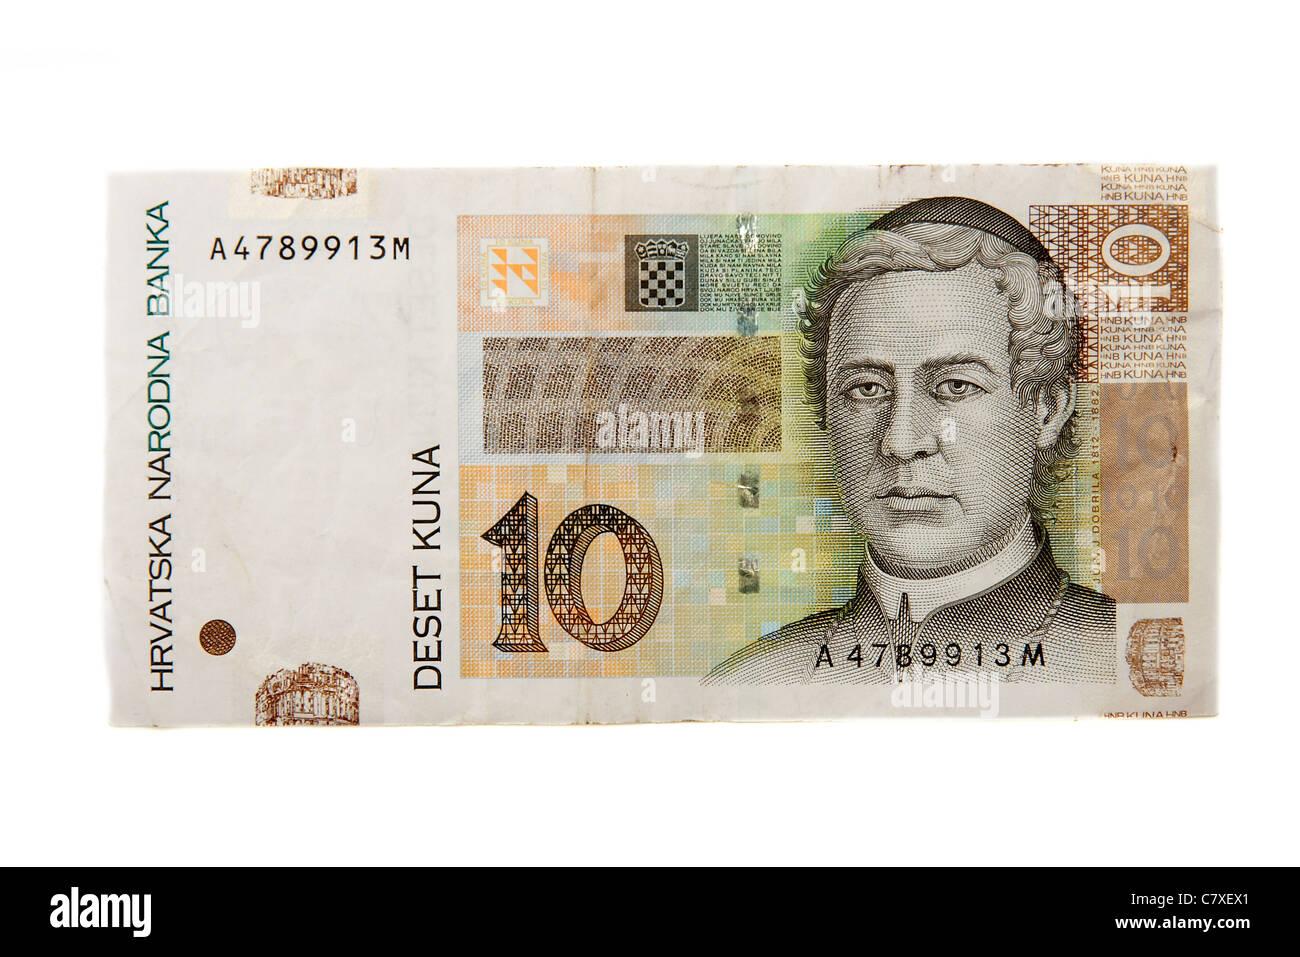 Banknote Of Croatia Stock Photos Banknote Of Croatia Stock